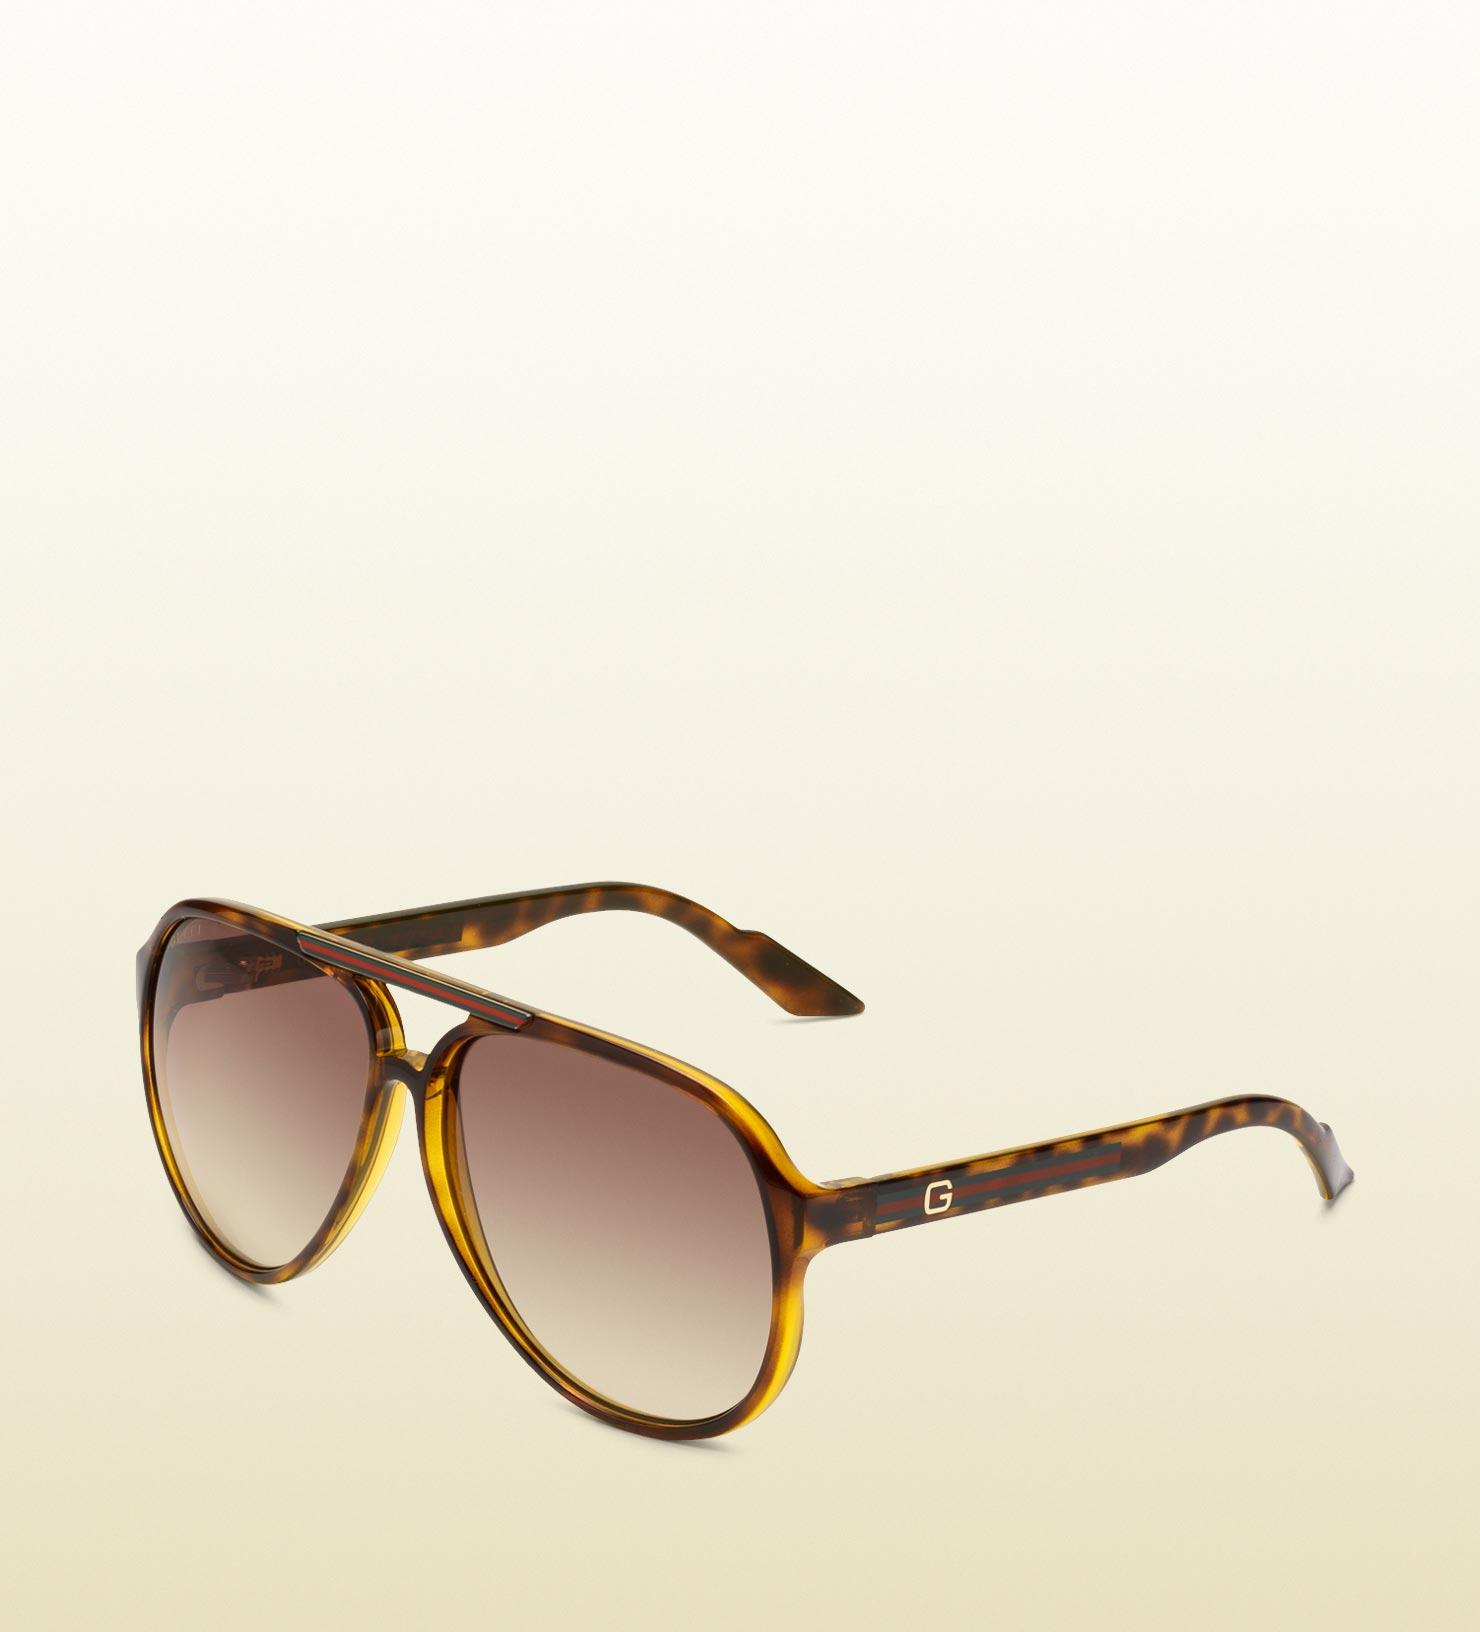 e8e21be47ba Lyst - Gucci Medium Aviator Sunglasses With G Detail And Signature ...